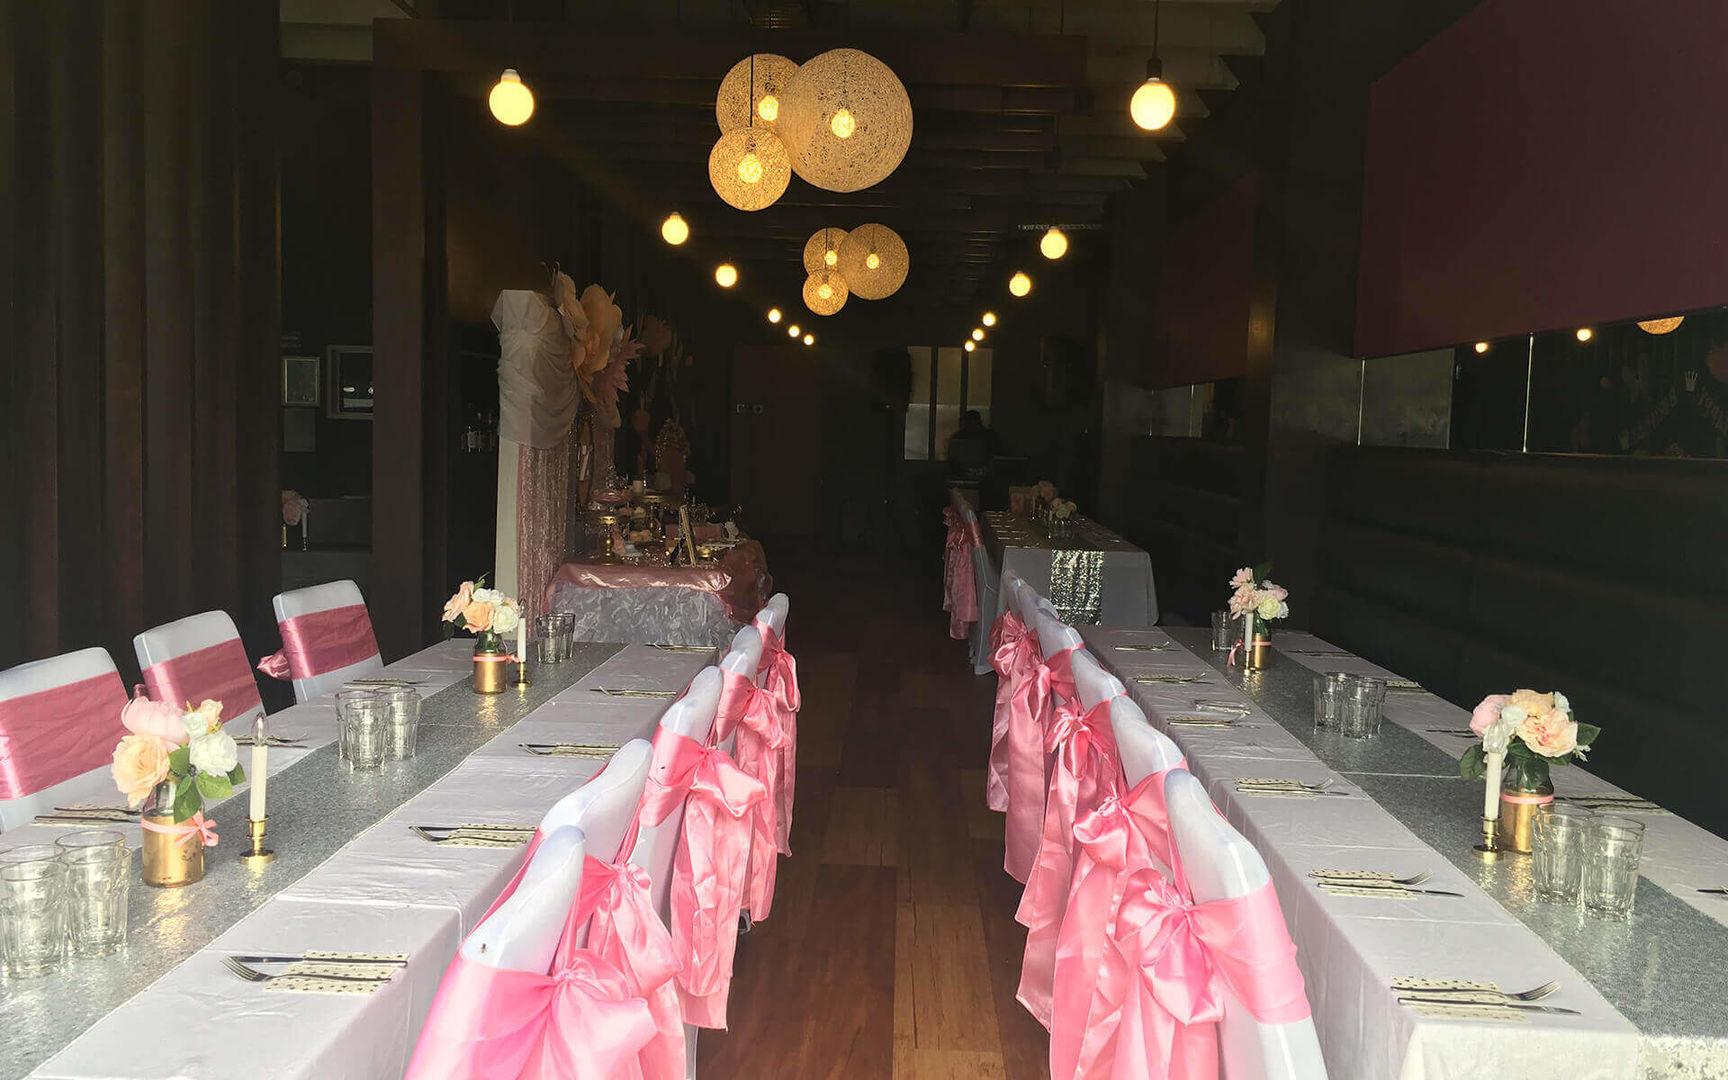 Indian Cuisine Restaurant & Takeaway Christchurch, NZ